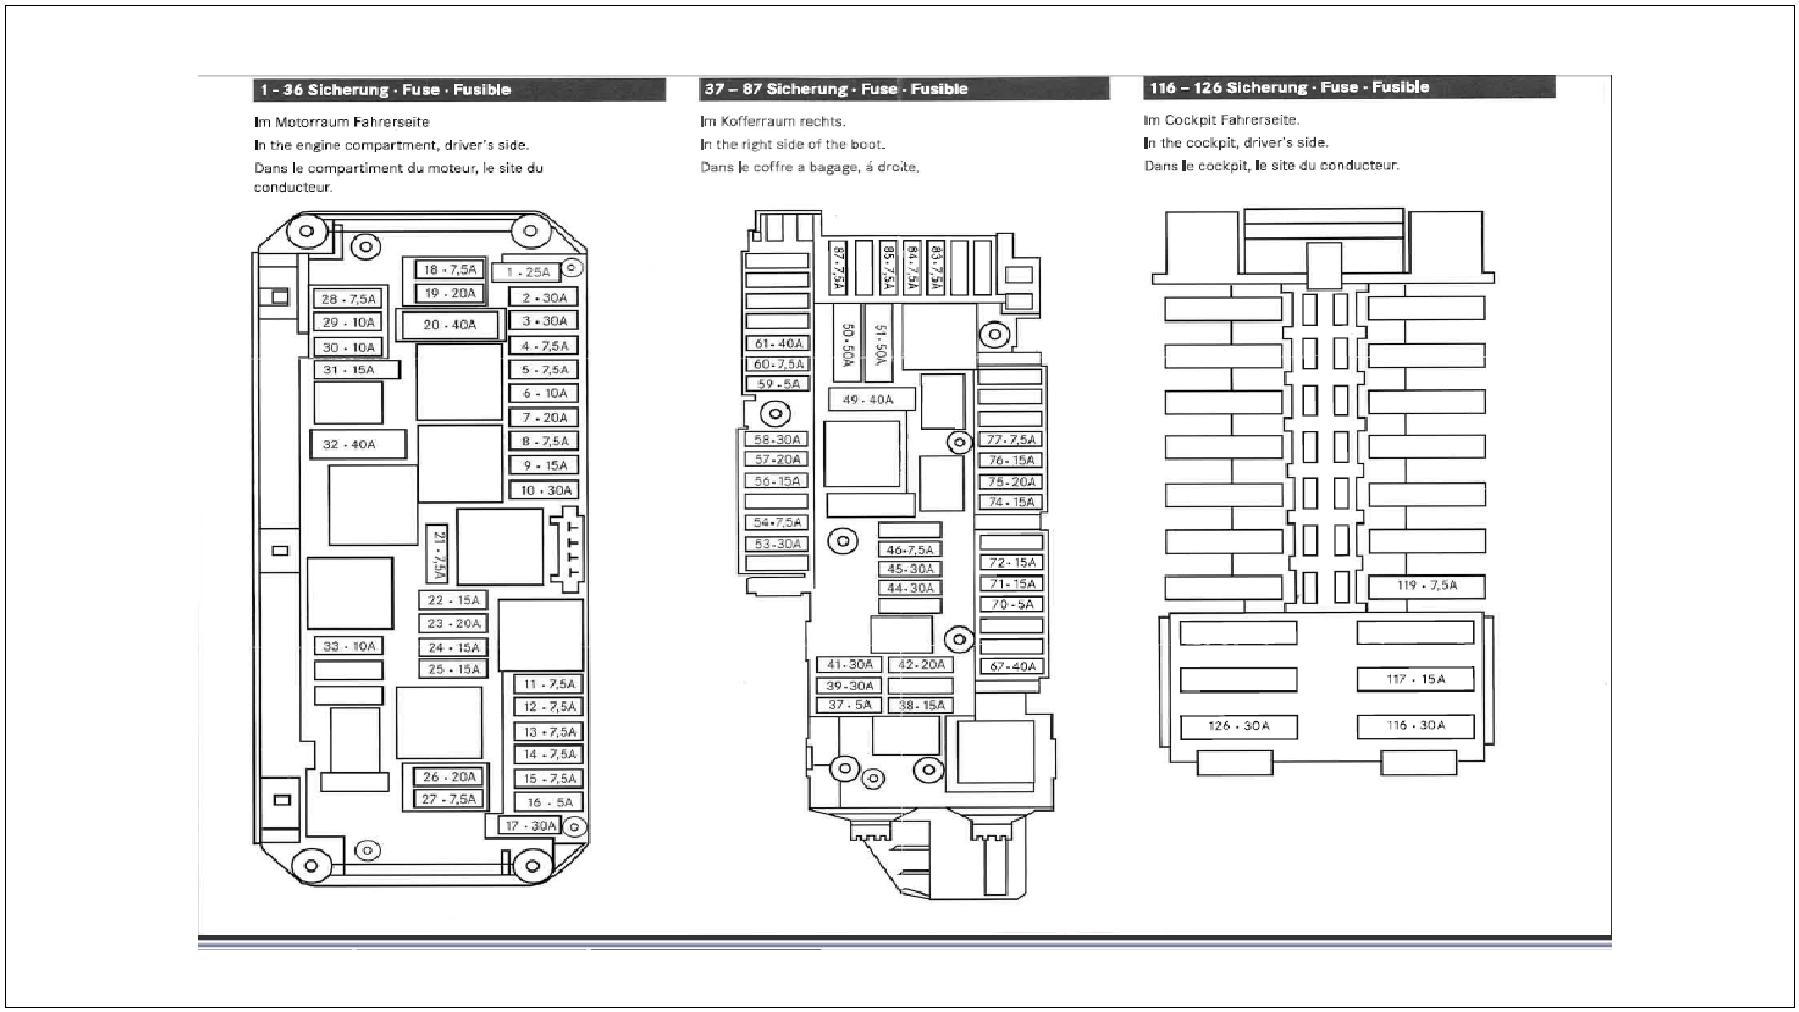 mercedes e550 fuse box diagram  mercedes  auto wiring diagram